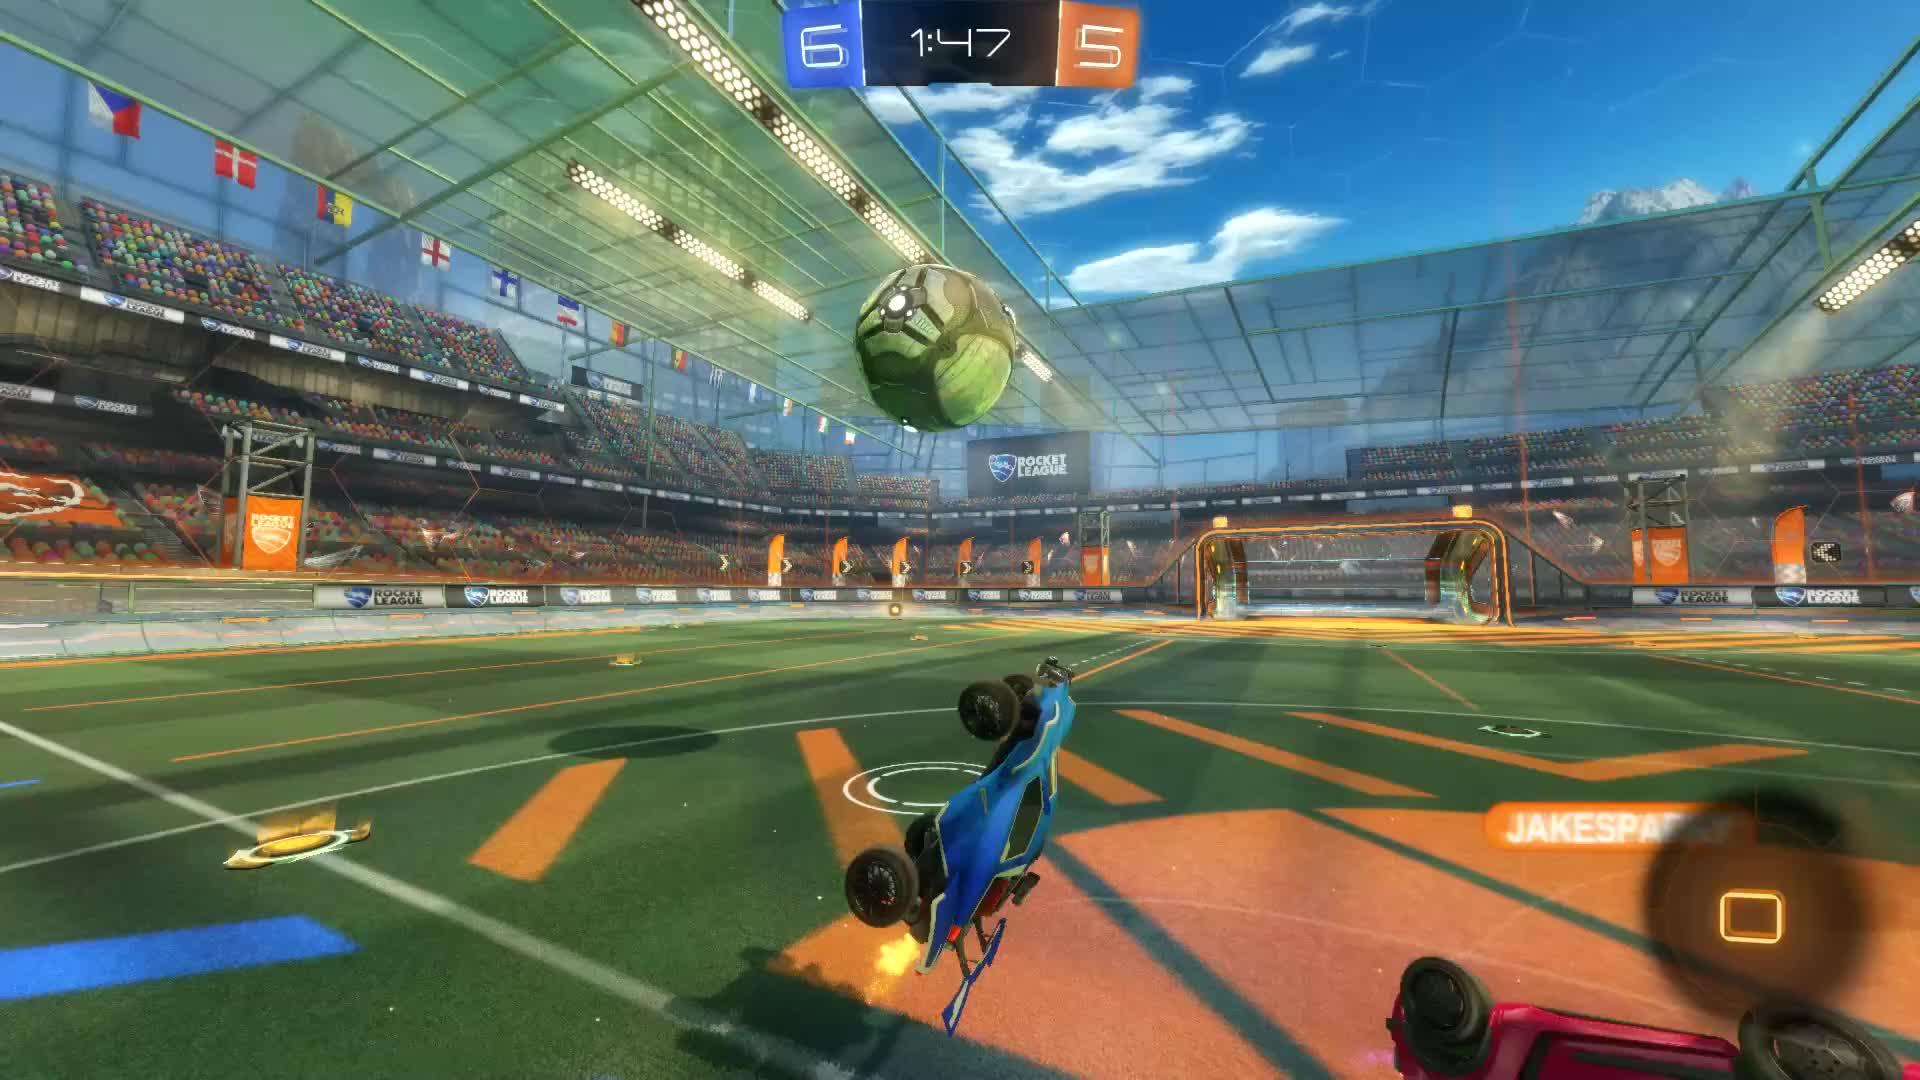 Gif Your Game, GifYourGame, Goal, Rocket League, RocketLeague, mUnO, Goal 12: mUnO GIFs